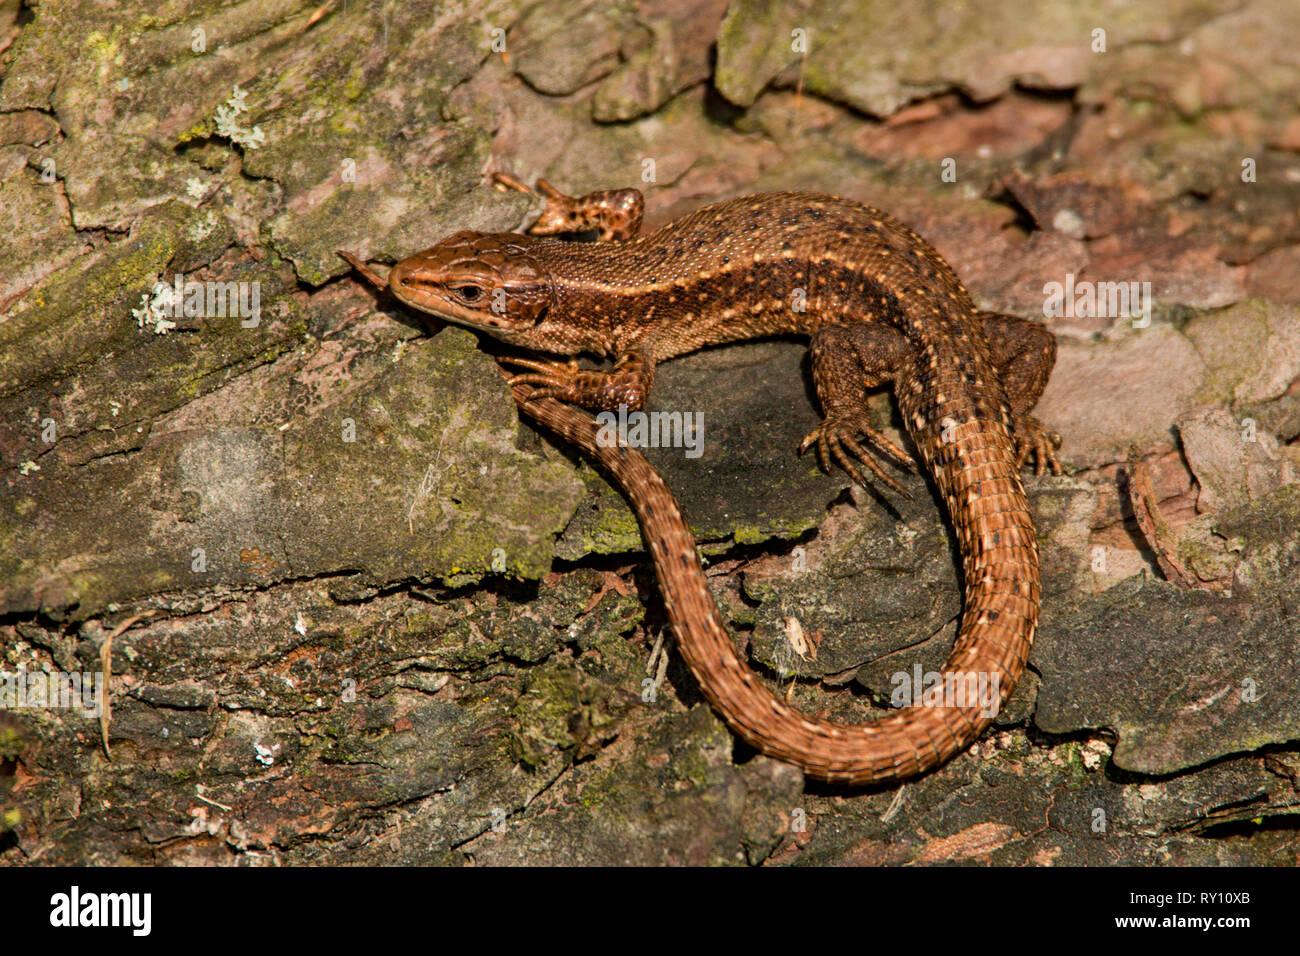 Gemeinsame Lizard (Lacerta vivipara) Stockfoto